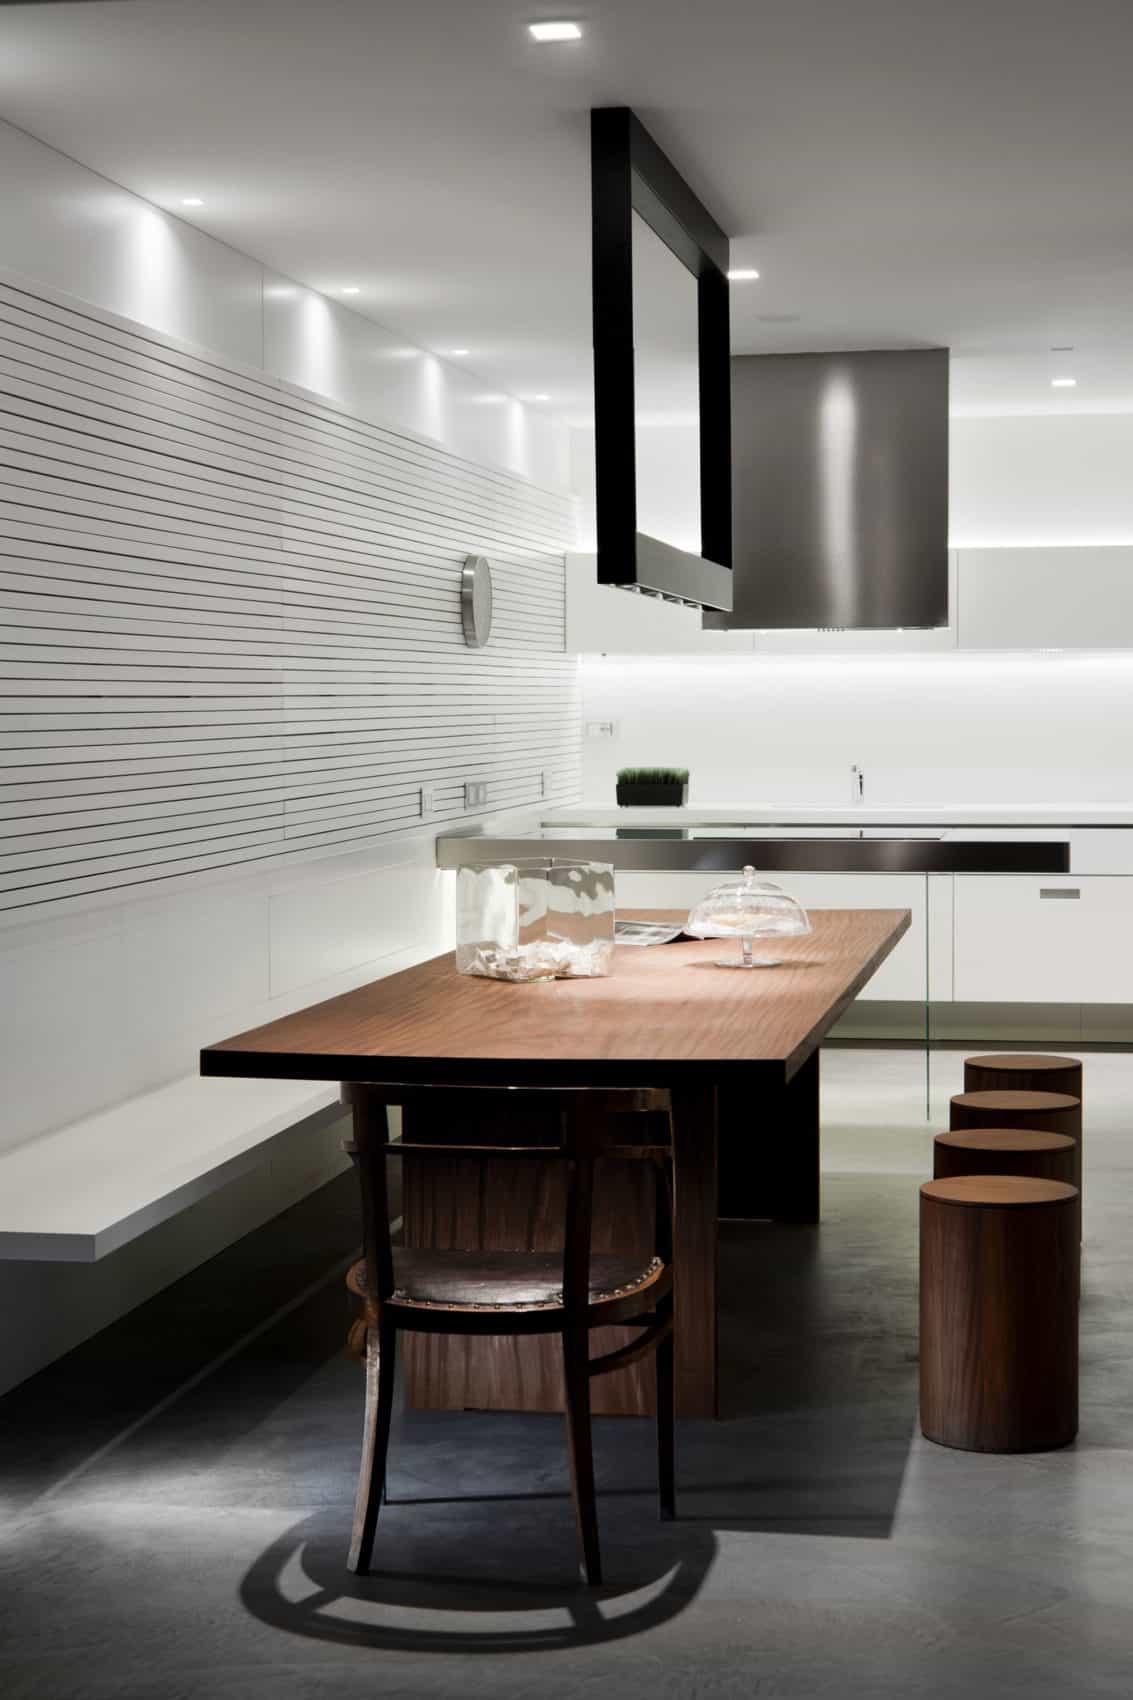 Garage Design by Edoardo Petri (7)